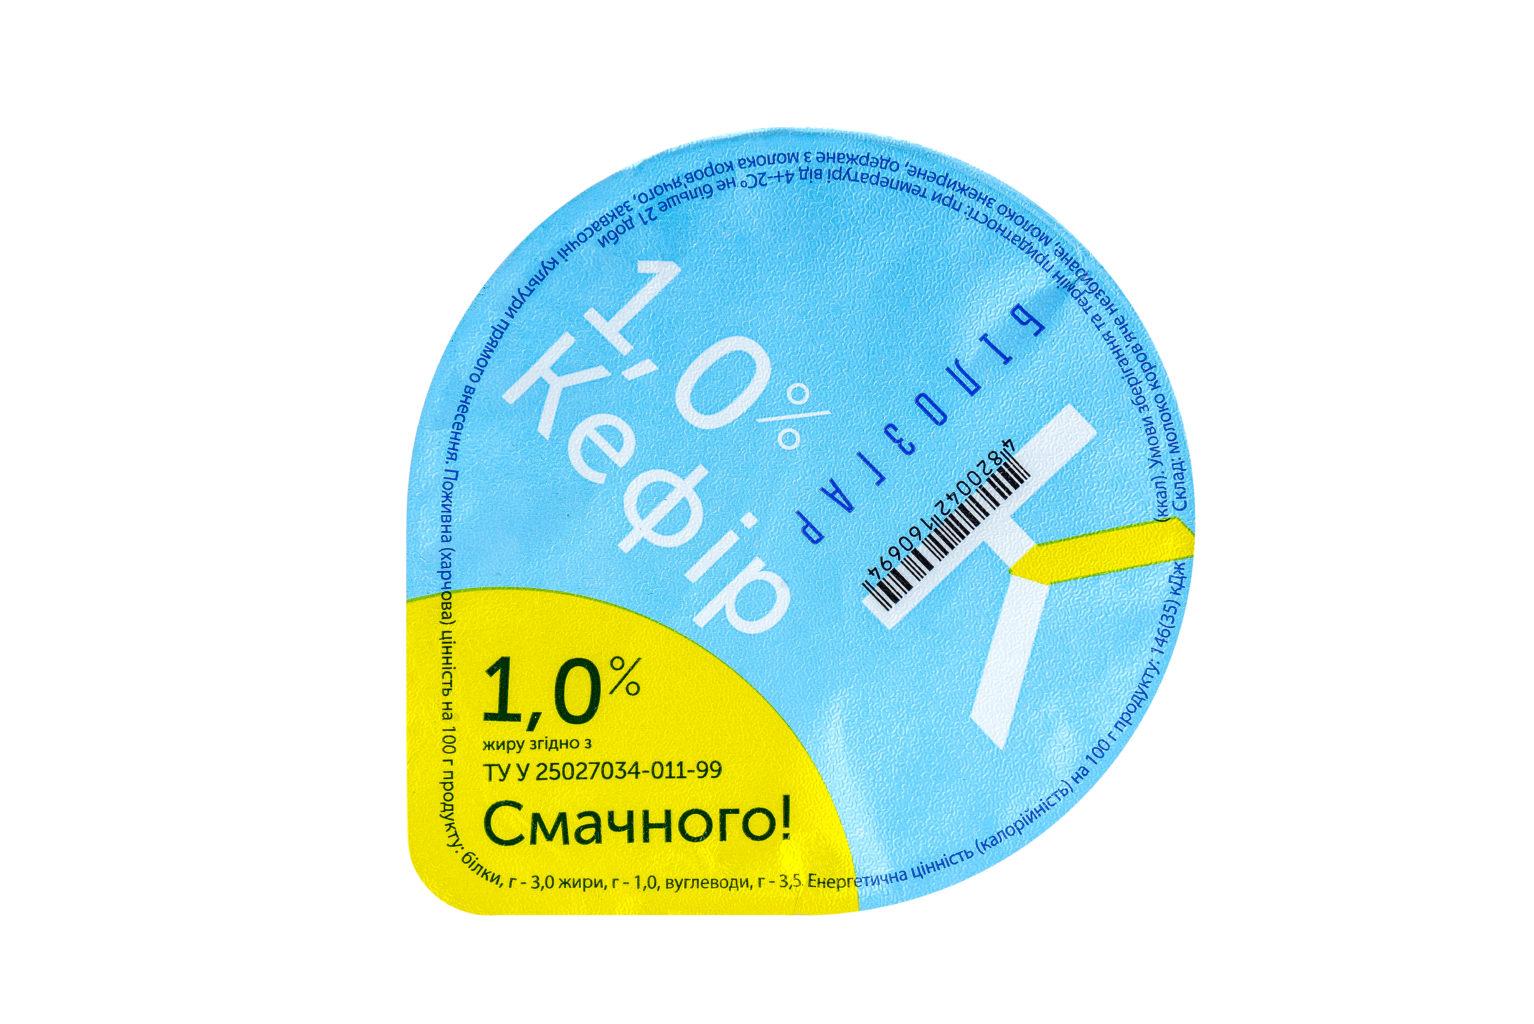 КЕФИР 1,0% ЖИРА